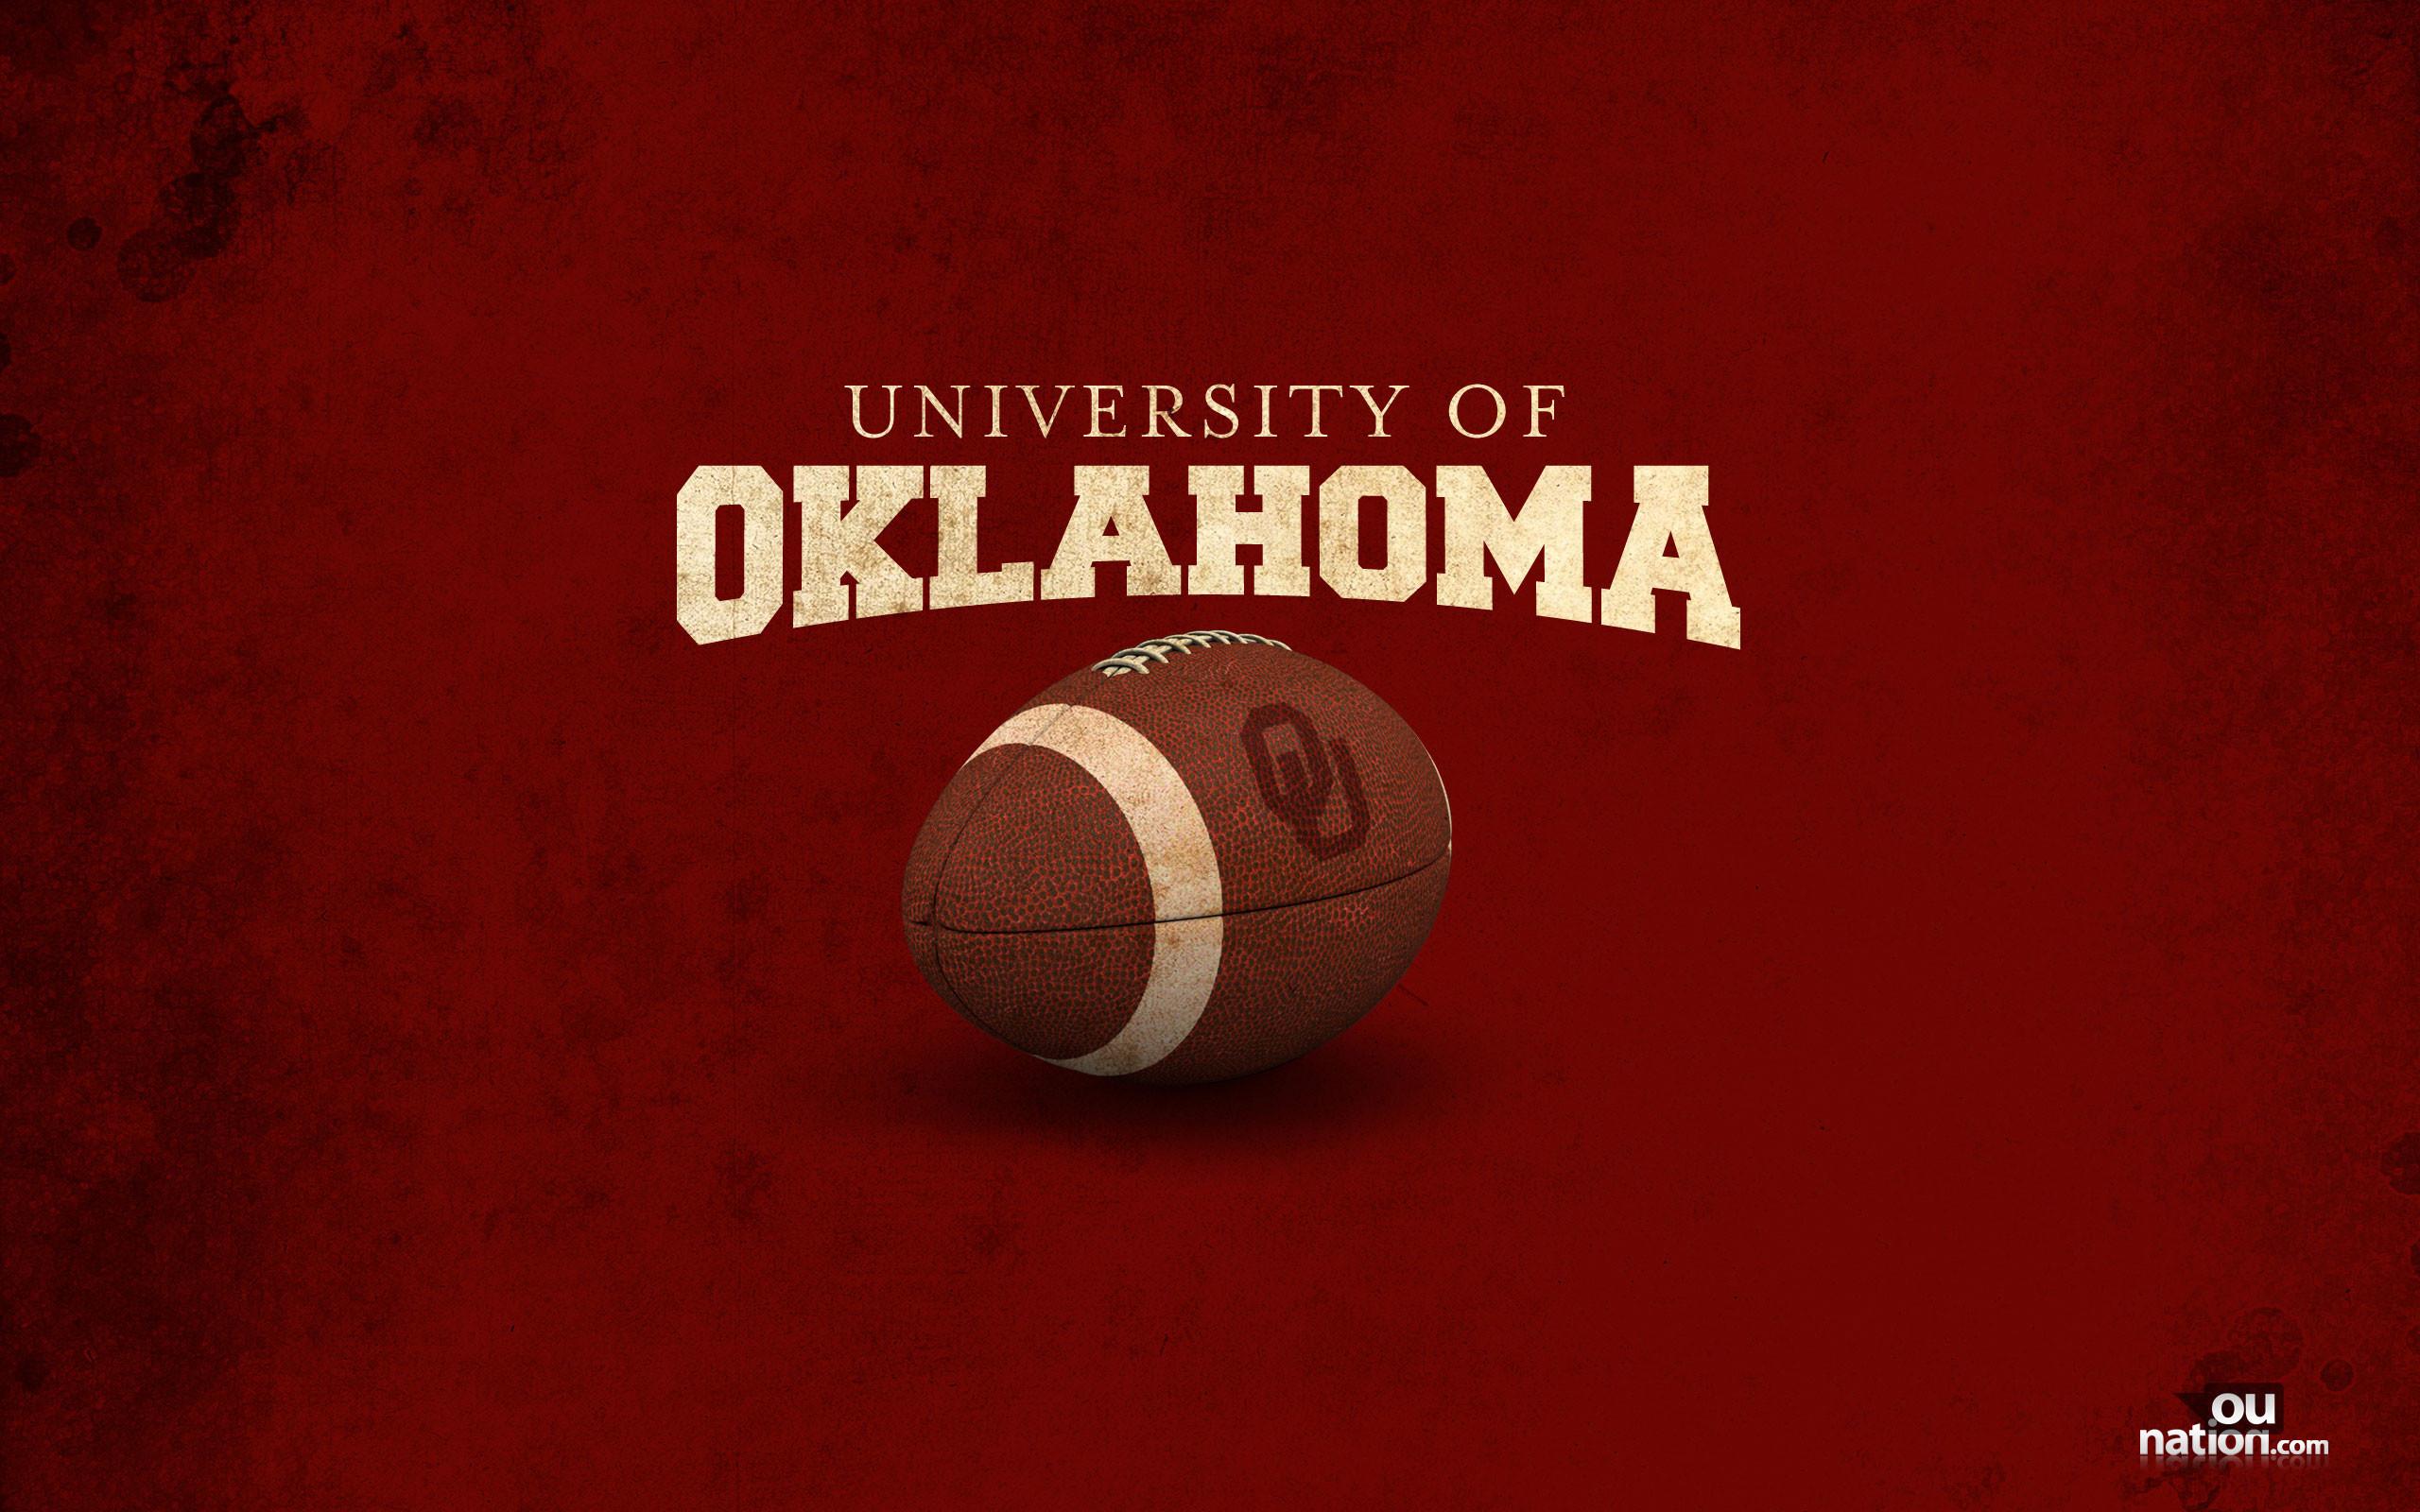 … University of Oklahoma Wallpaper …